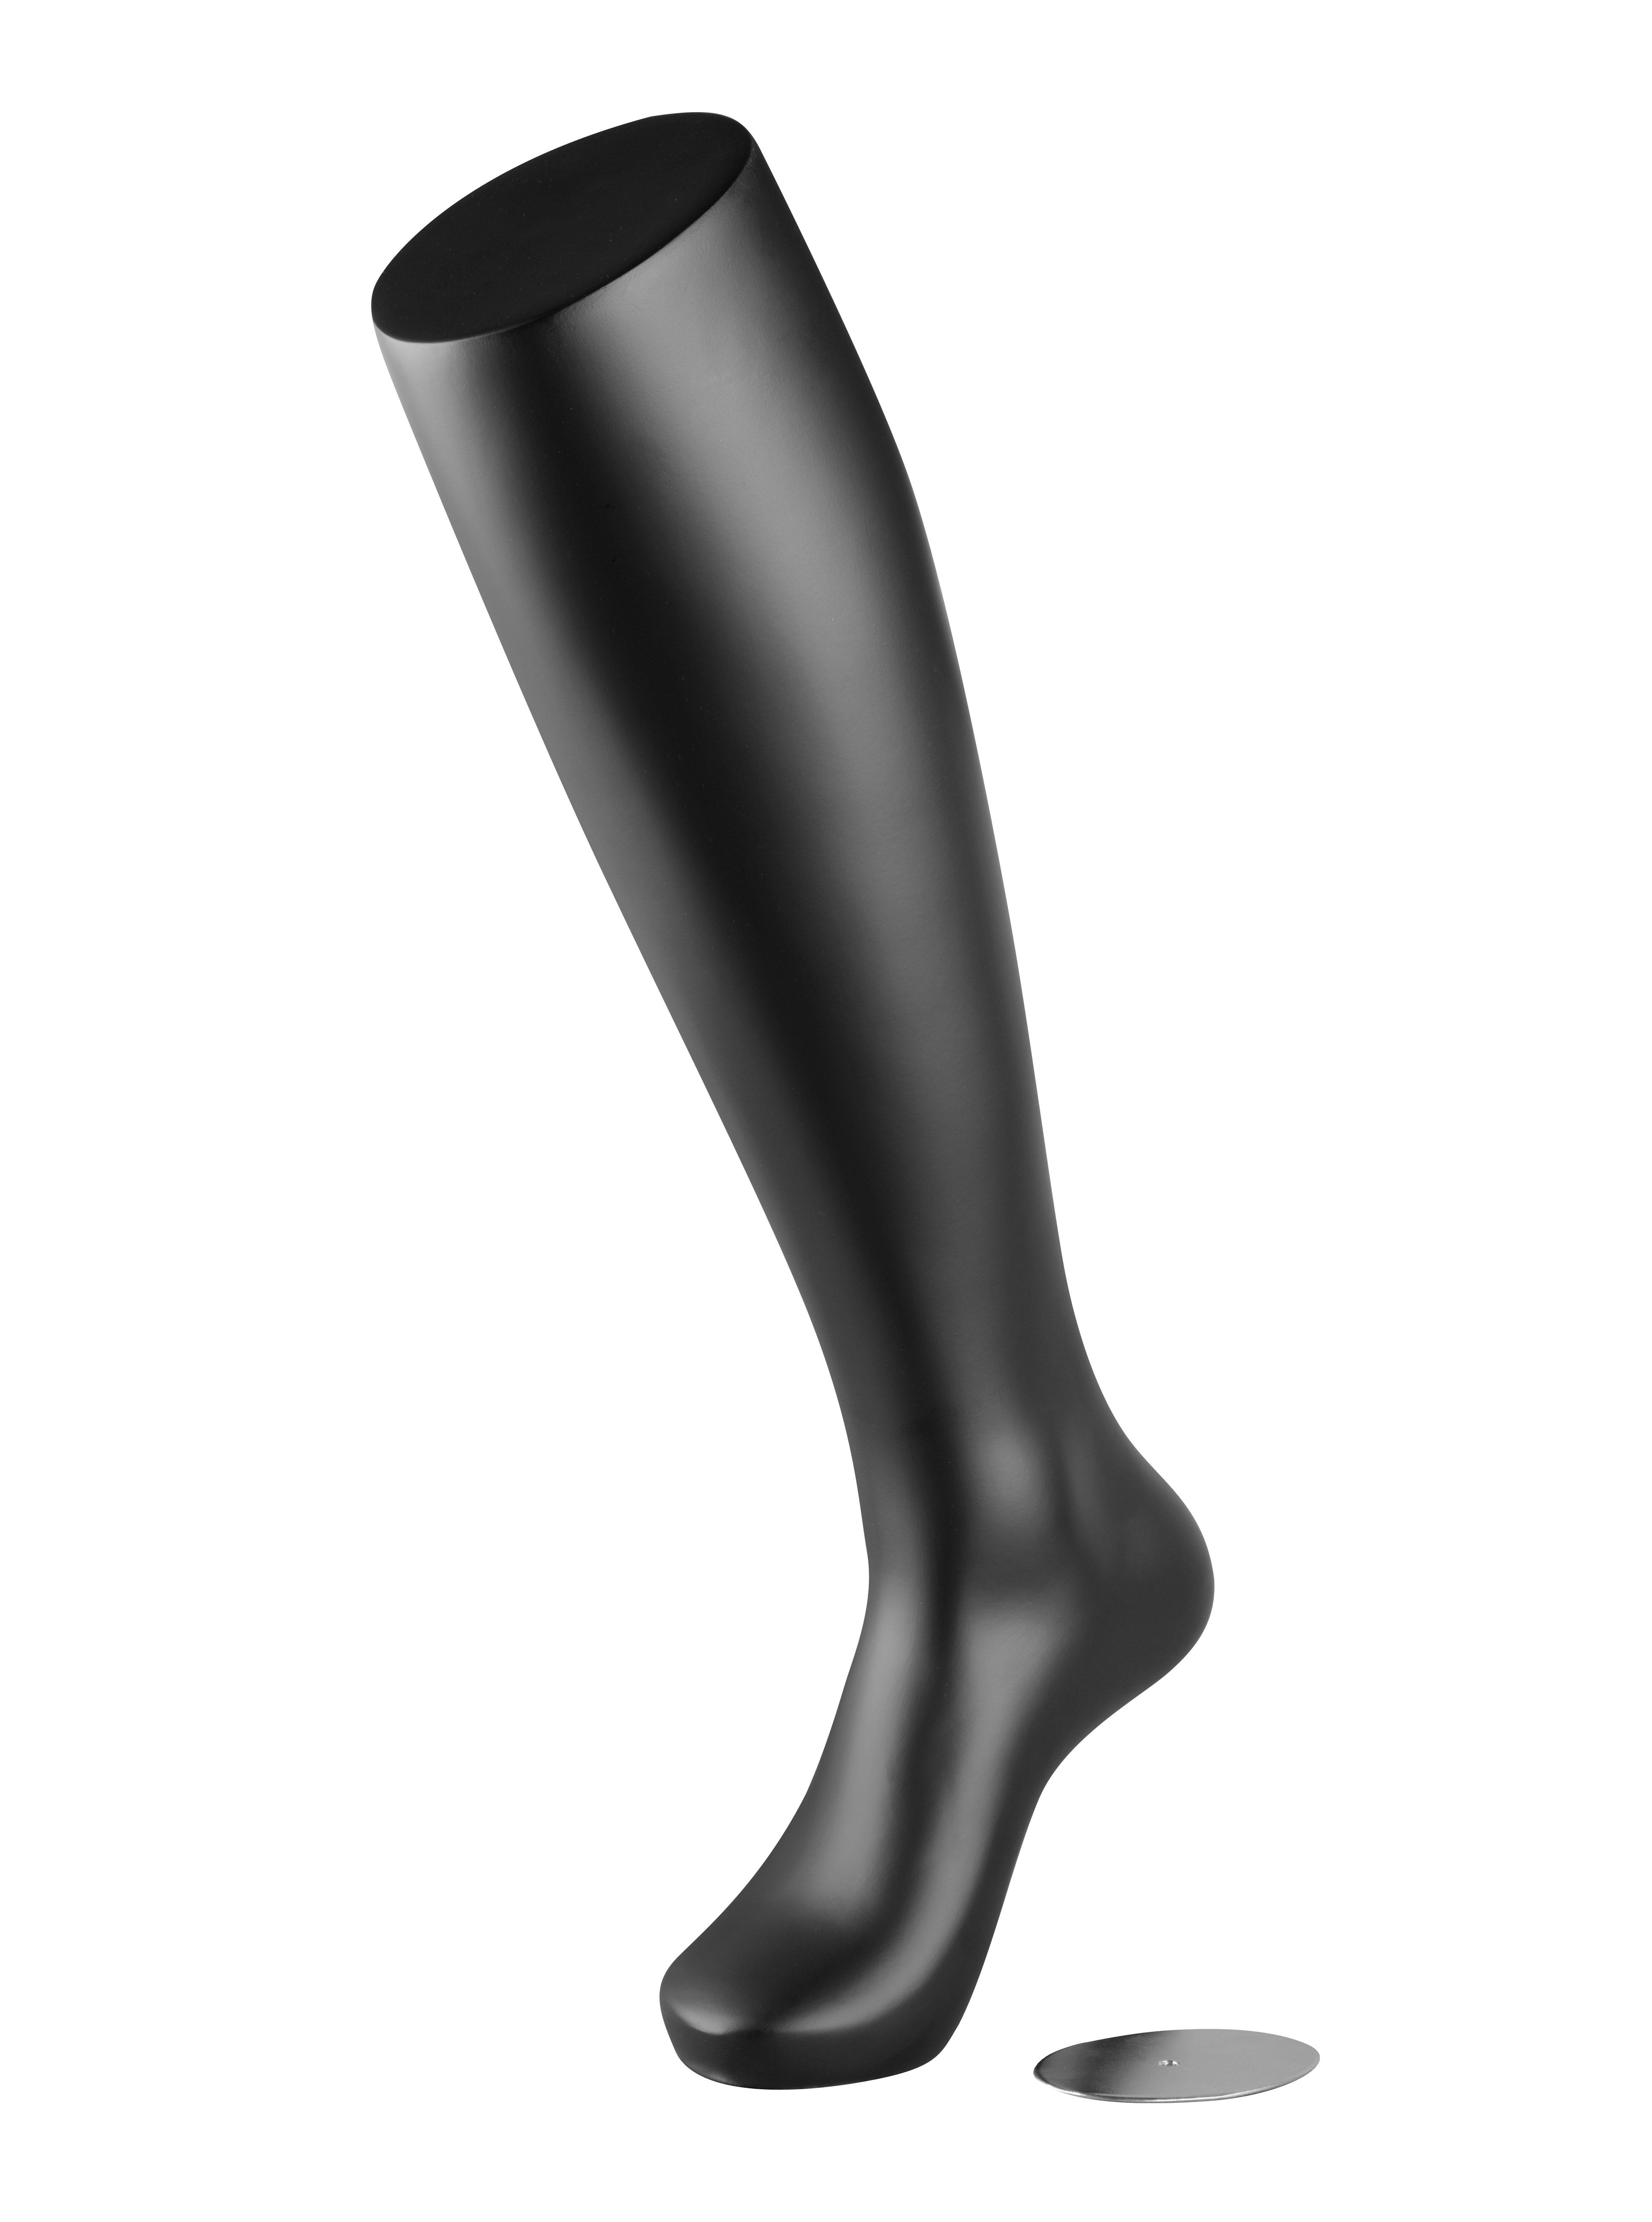 figurína - noha 58 cm, černá matná